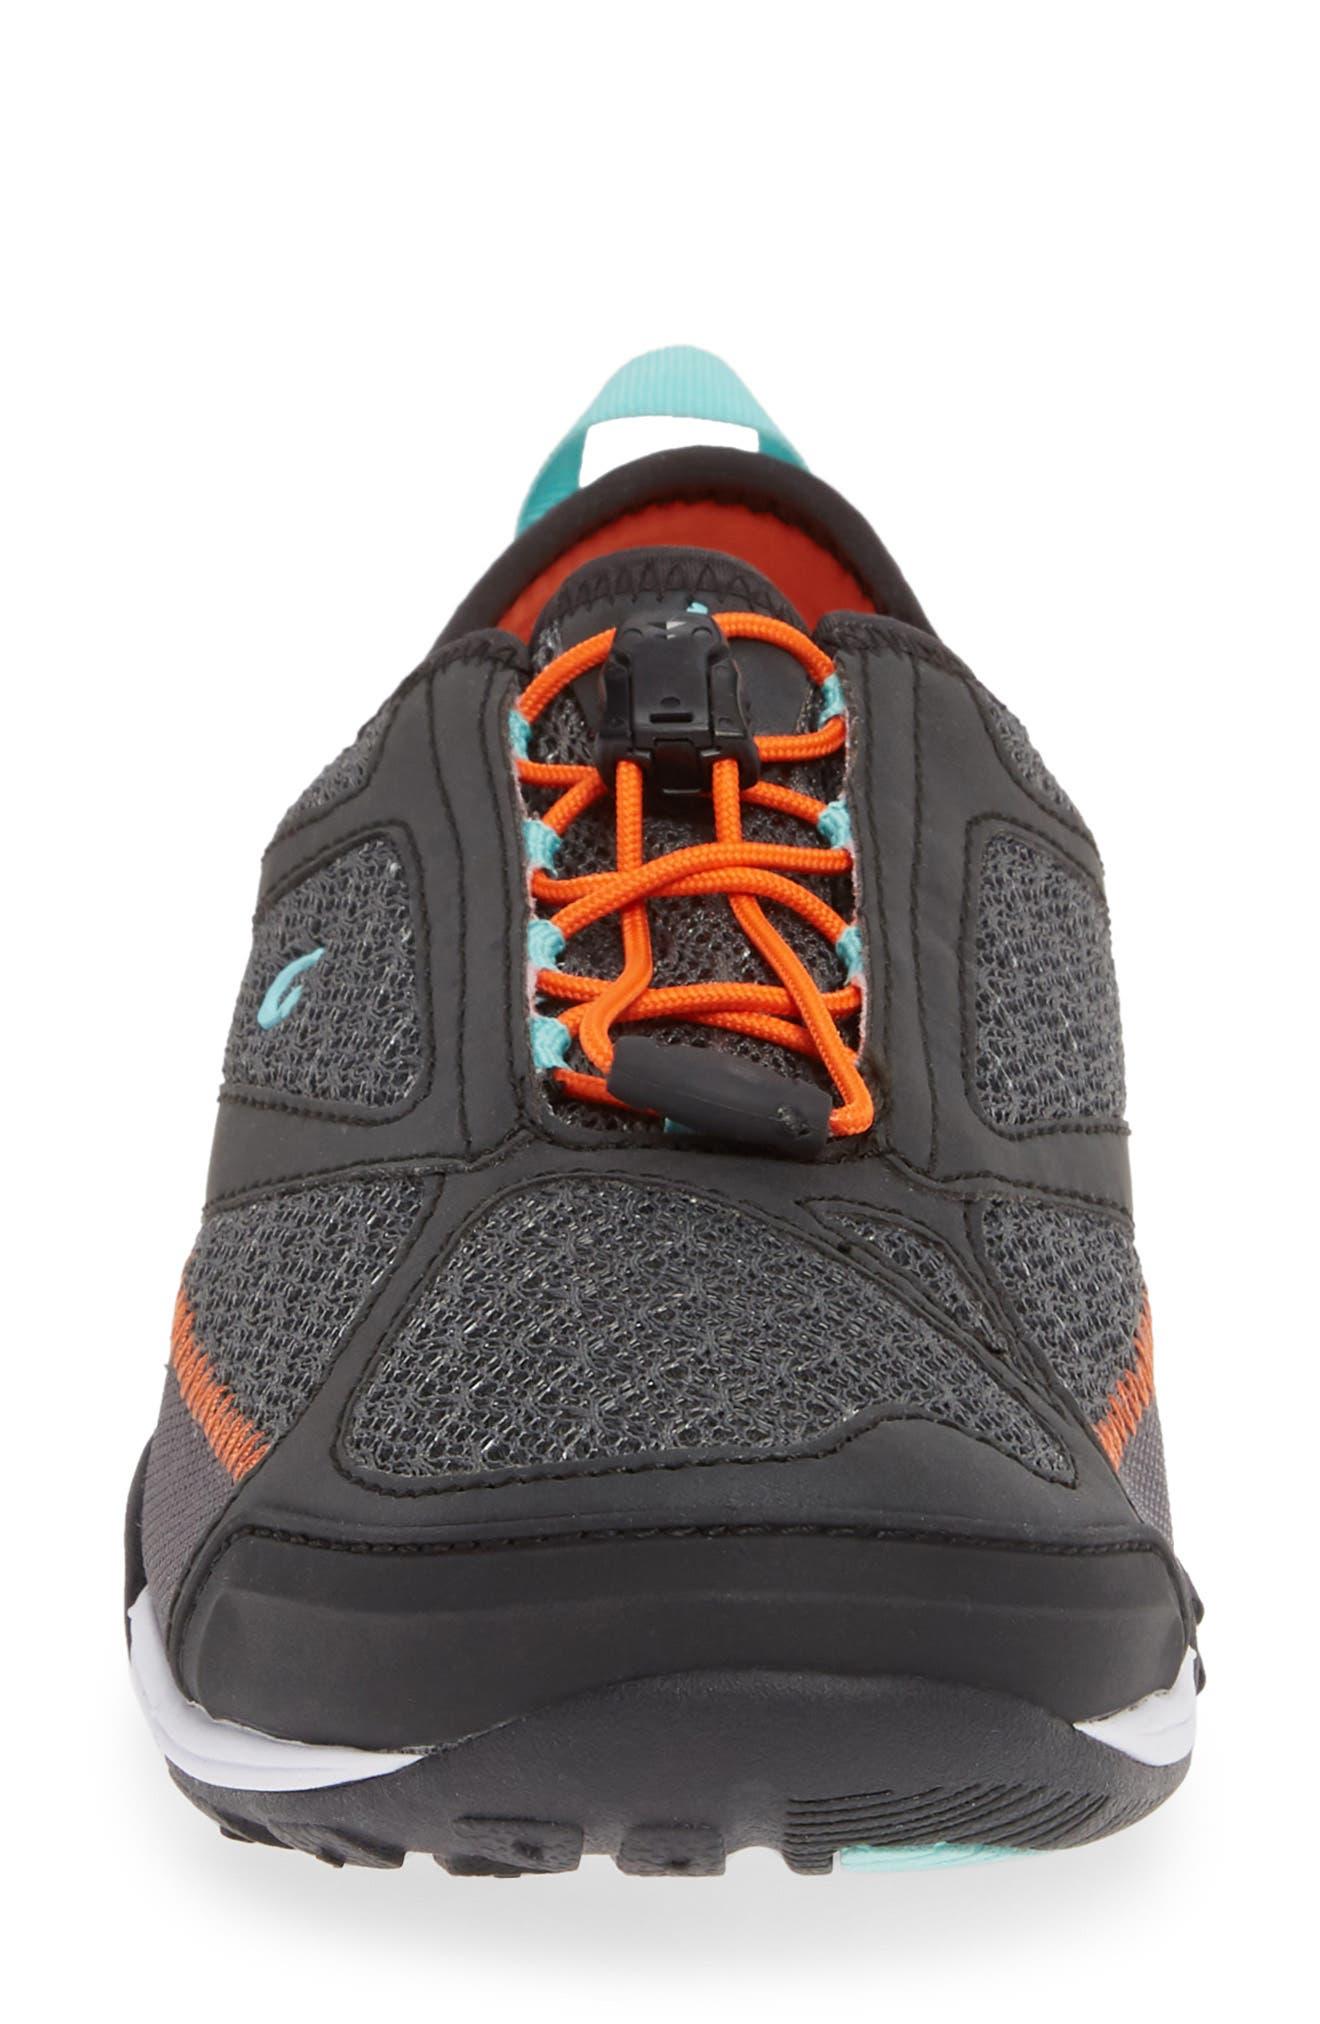 'Eleu' Water-Resistant Sneaker,                             Alternate thumbnail 4, color,                             DARK SHADOW/ LAVA ROCK FABRIC